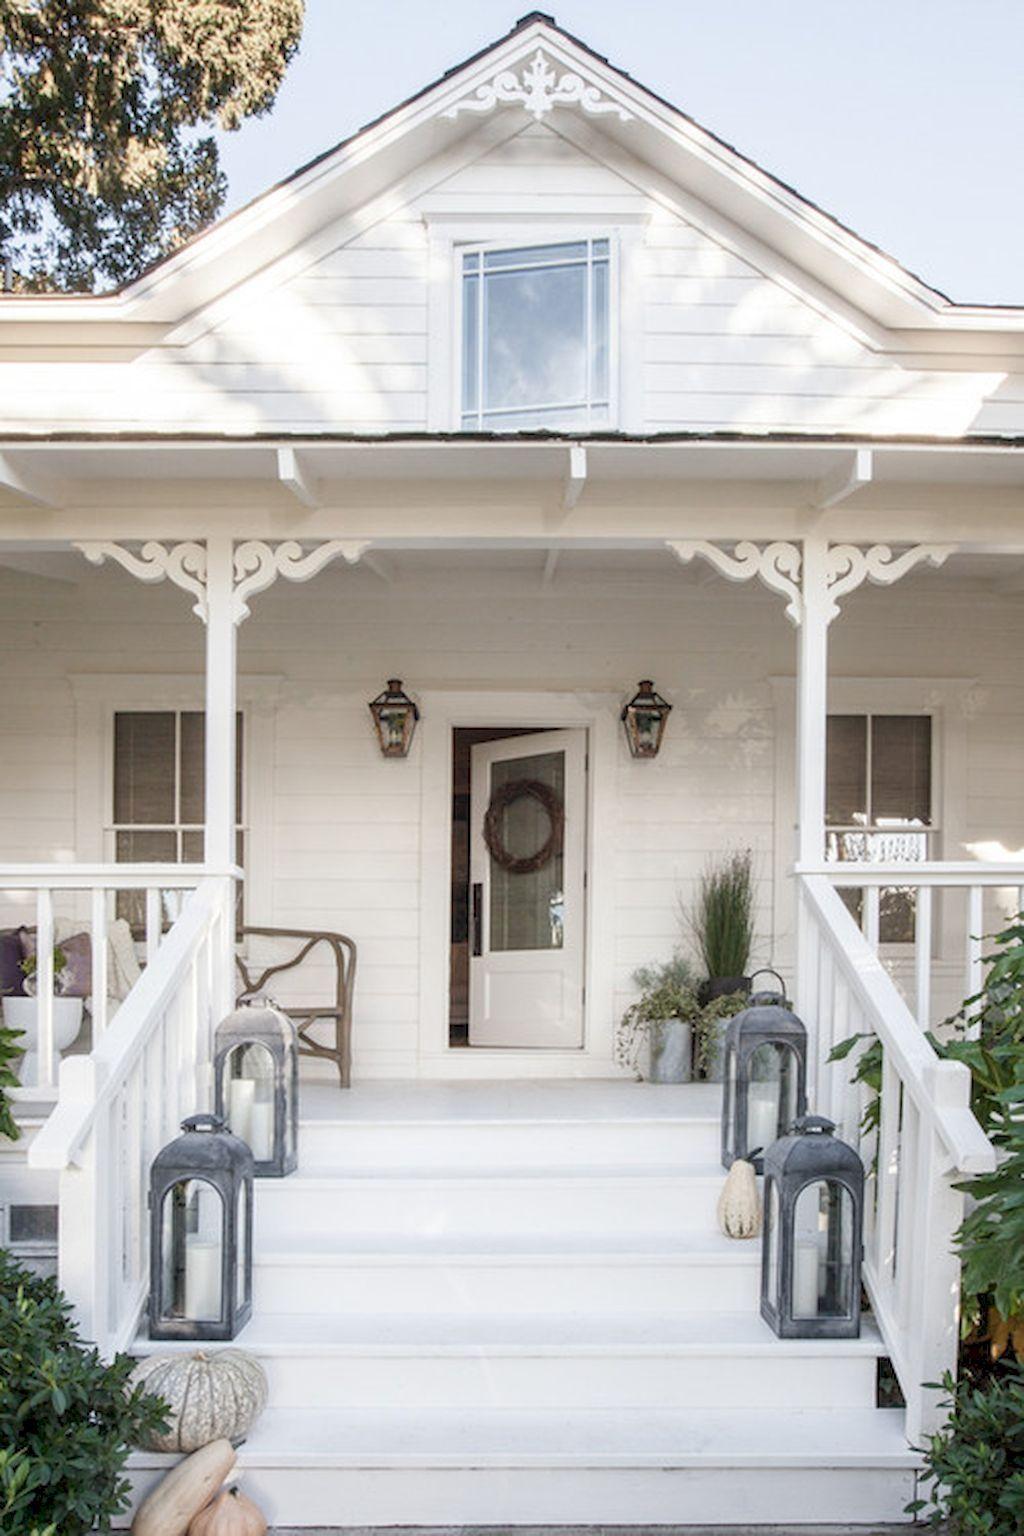 51 beautiful farmhouse front porch decor ideas modern on beautiful modern farmhouse trending exterior design ideas id=15757